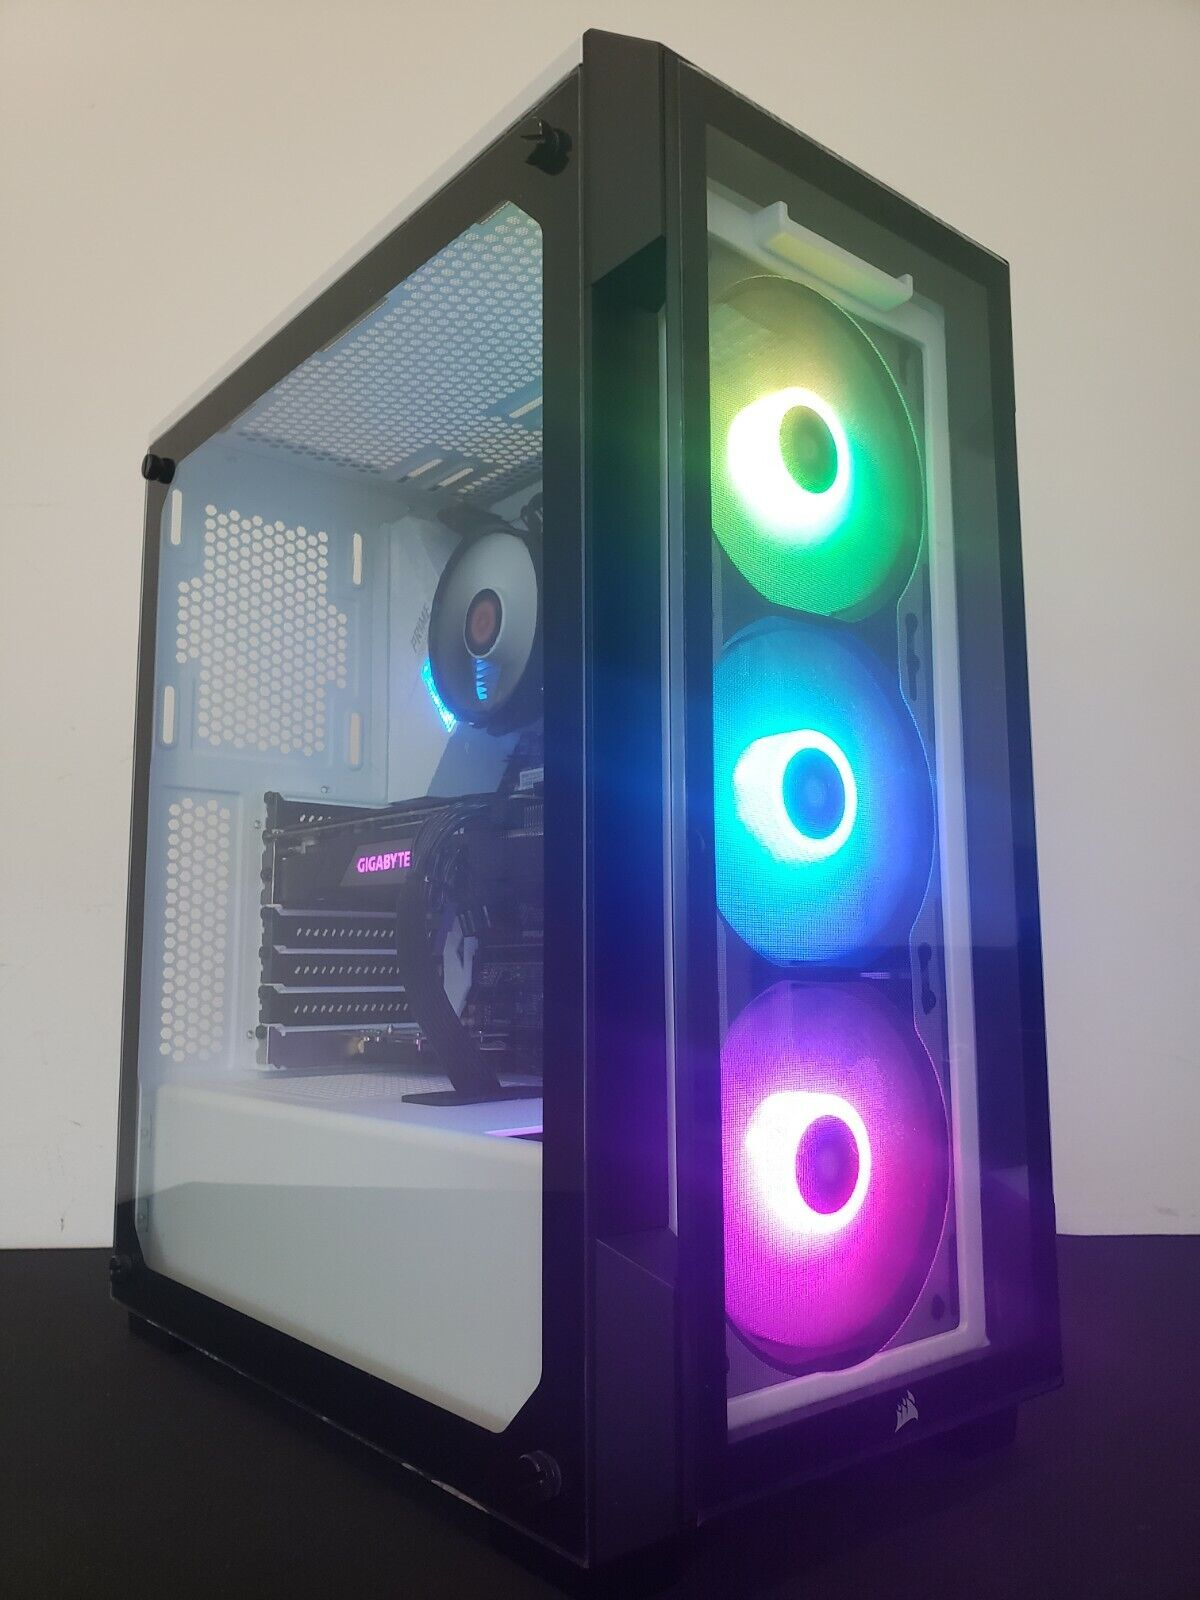 corsair gaming pc i7 10700 rtx 2080